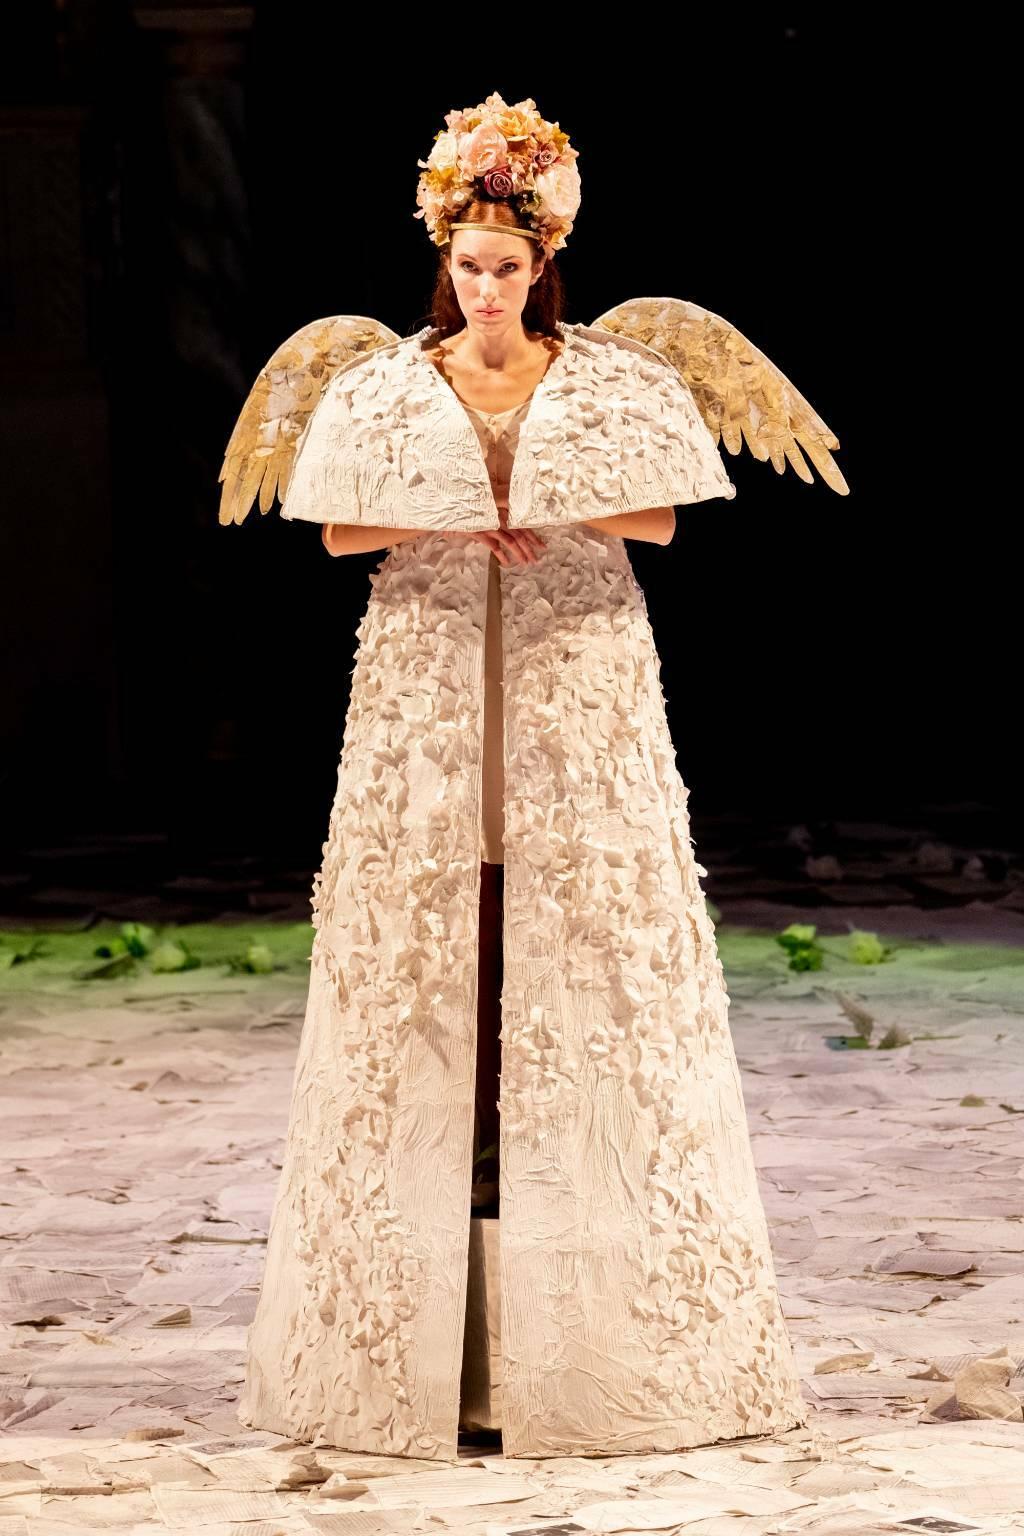 l'ange de nisida